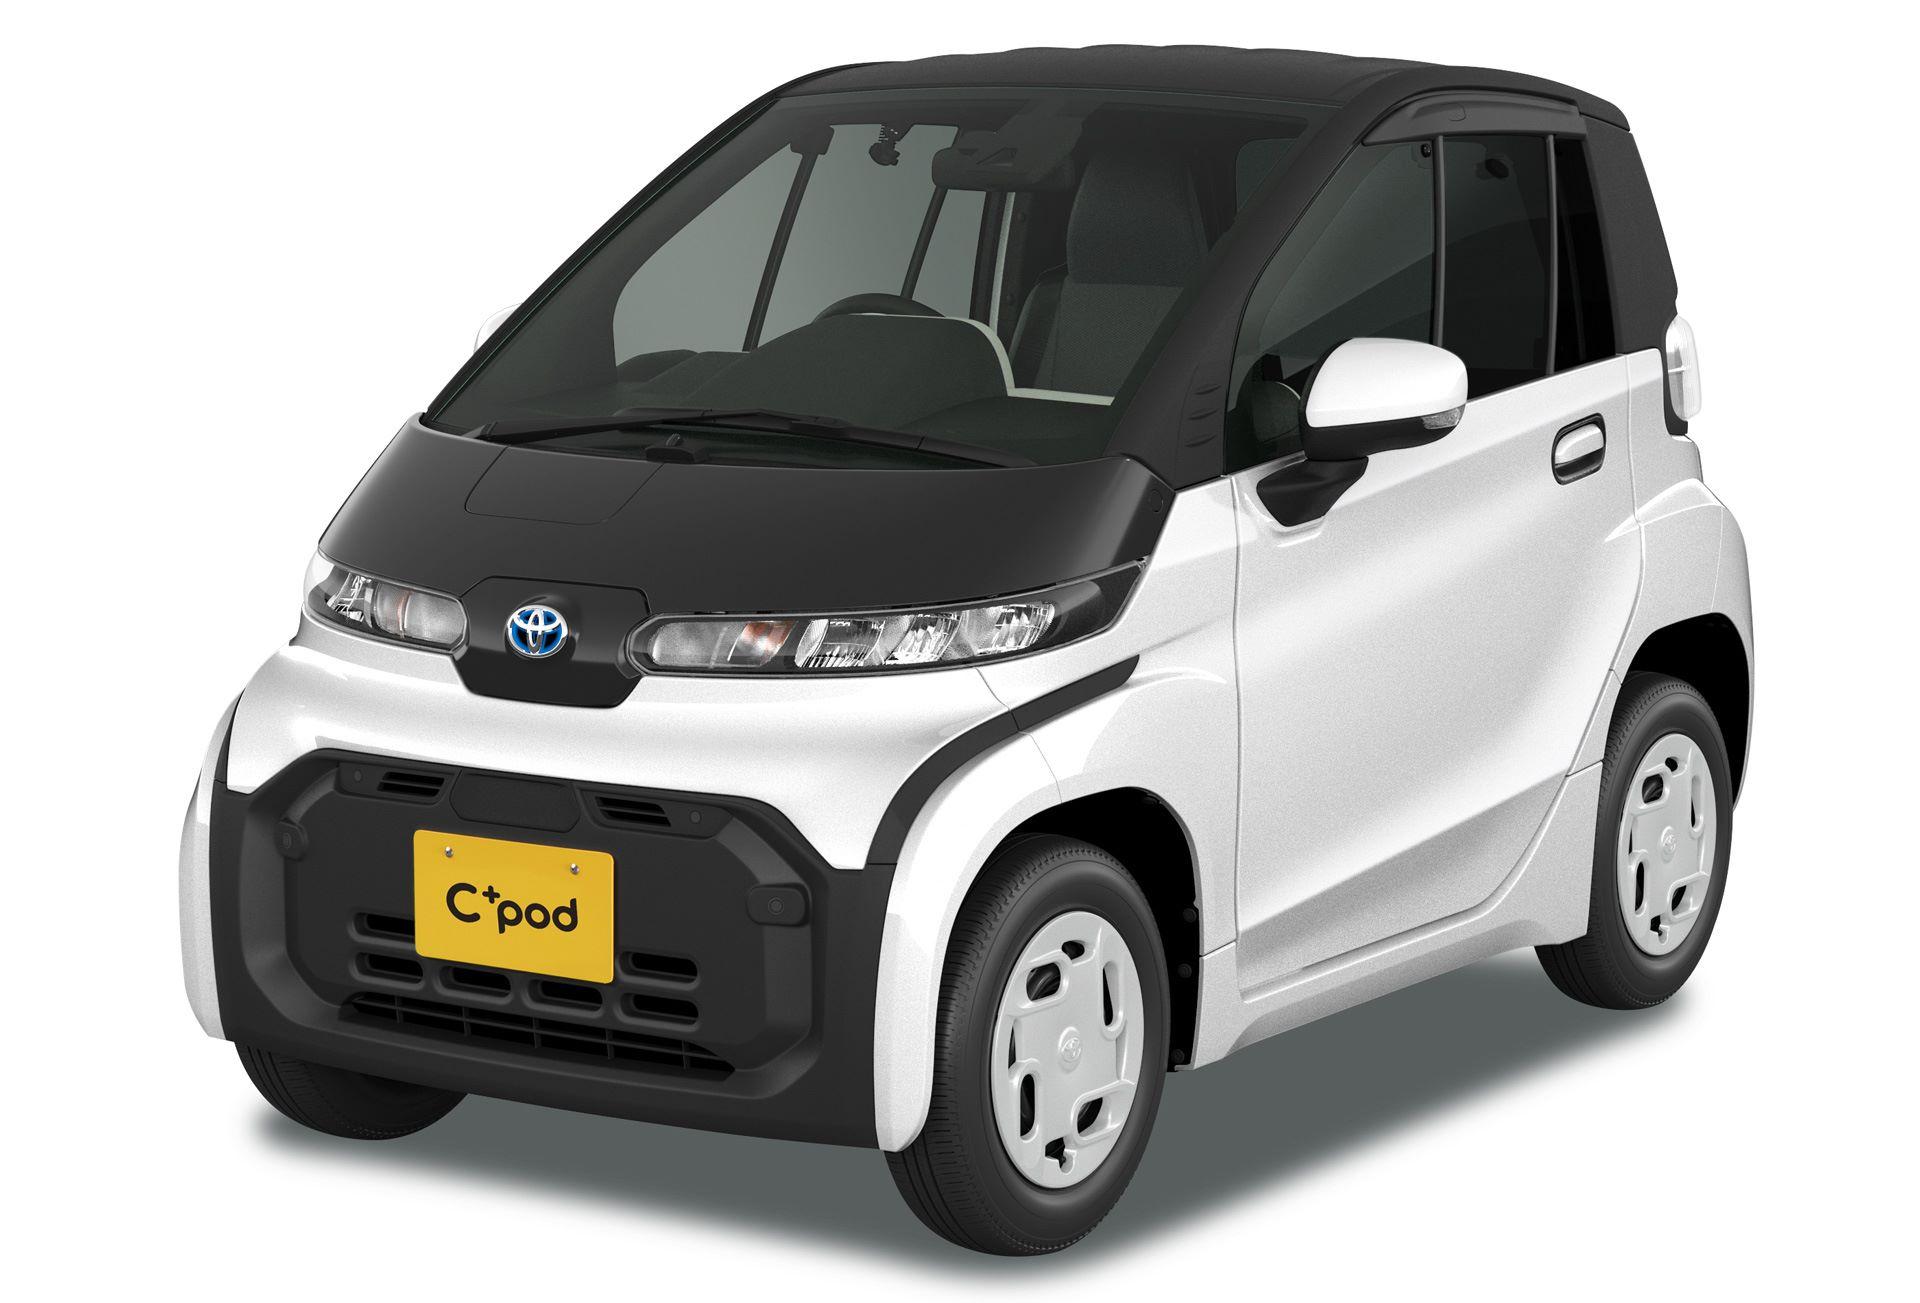 Toyota-C-pod-13